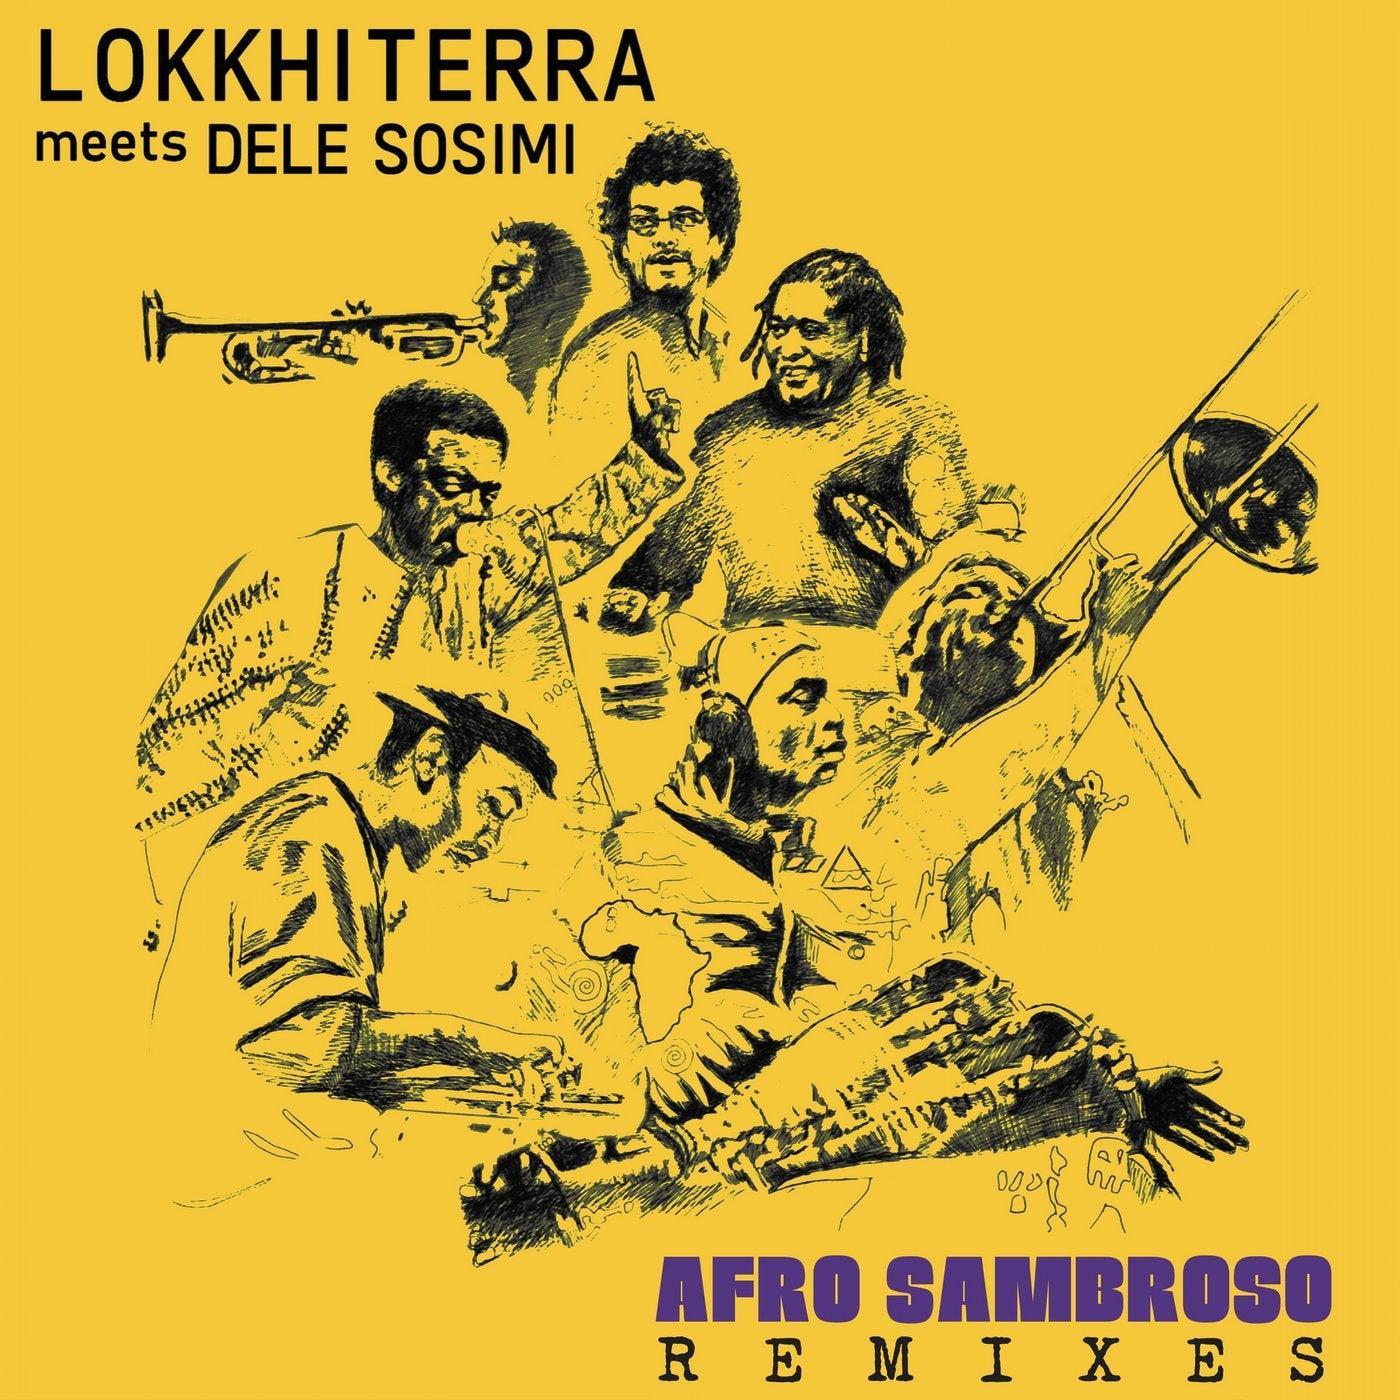 Afro Sambroso (SEQU3L Remix)